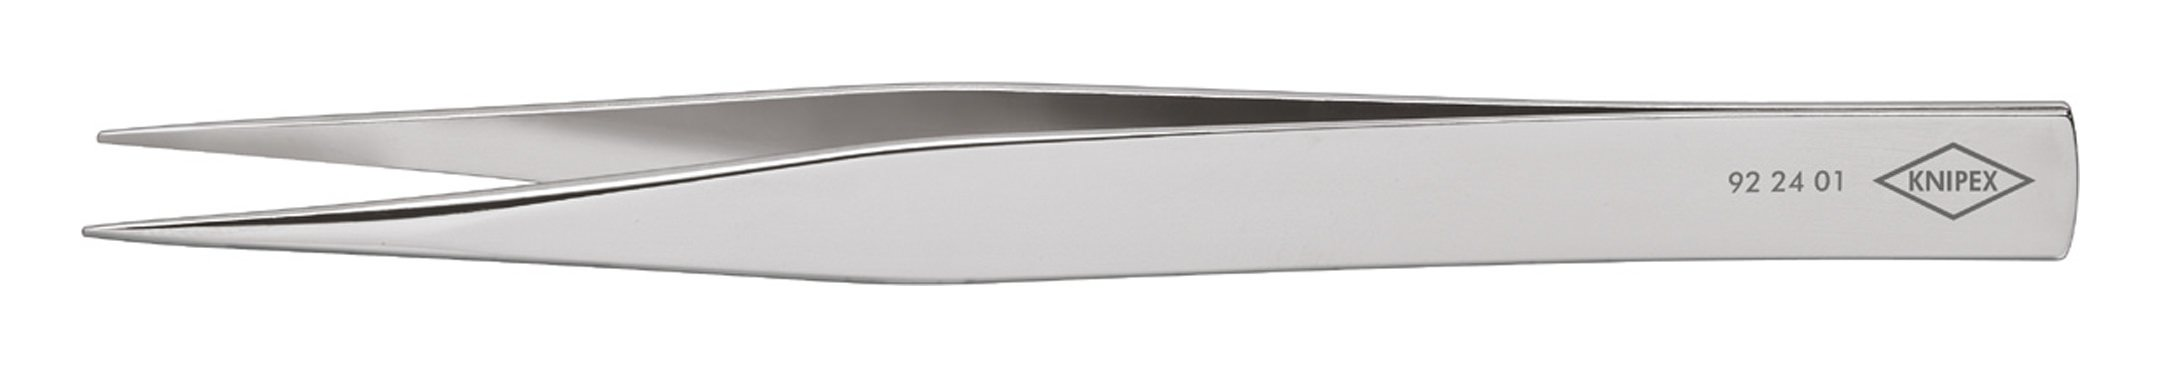 Knipex Präzisions-Pinzette spitz 120mm poliert - 92 24 01